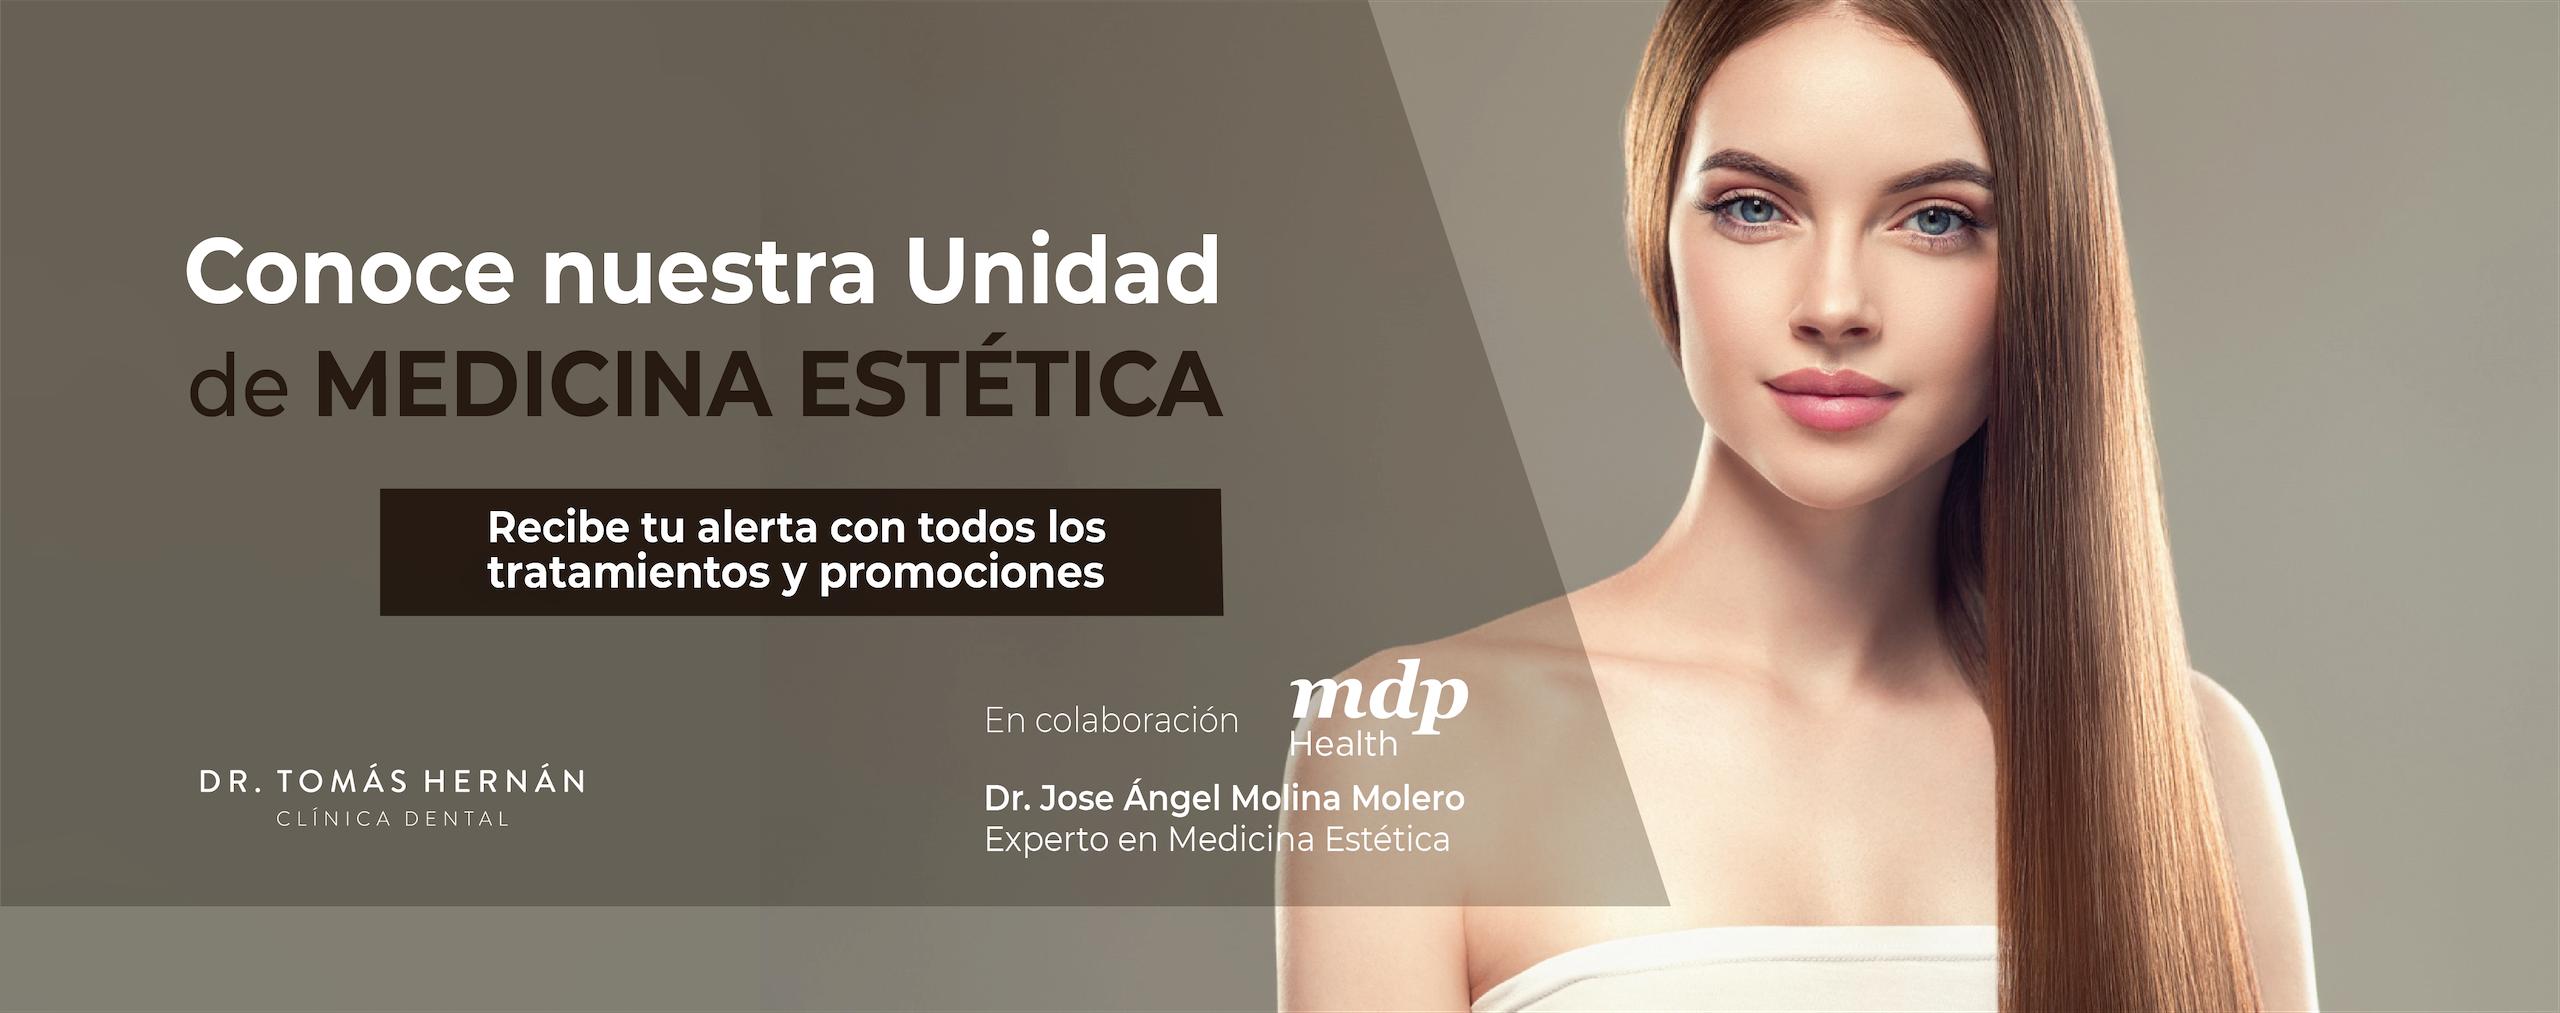 medicina estetica madrid